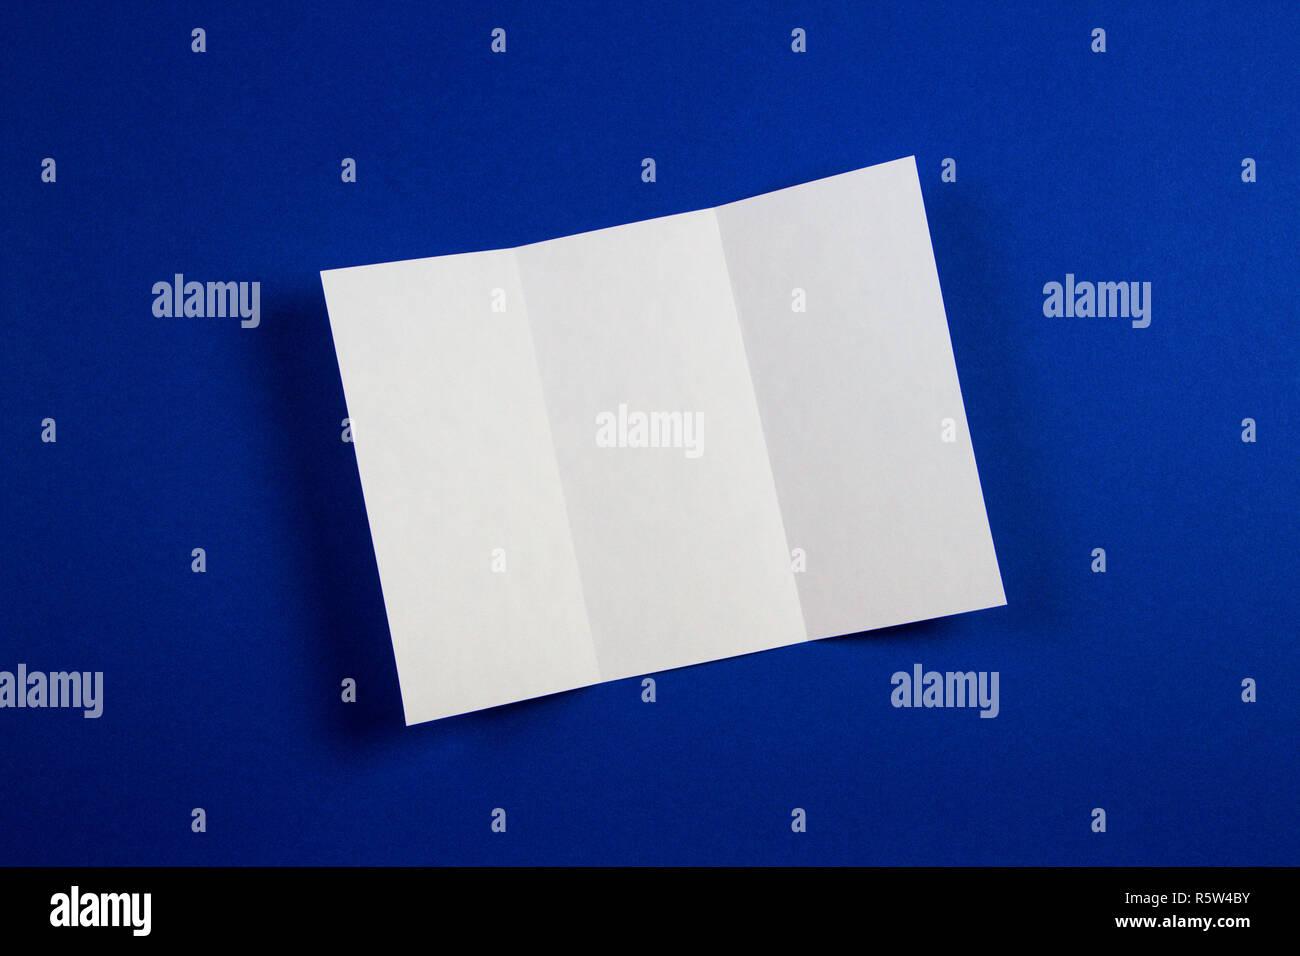 Maquette de blank white tri fold brochure brochure sur fond bleu Photo Stock